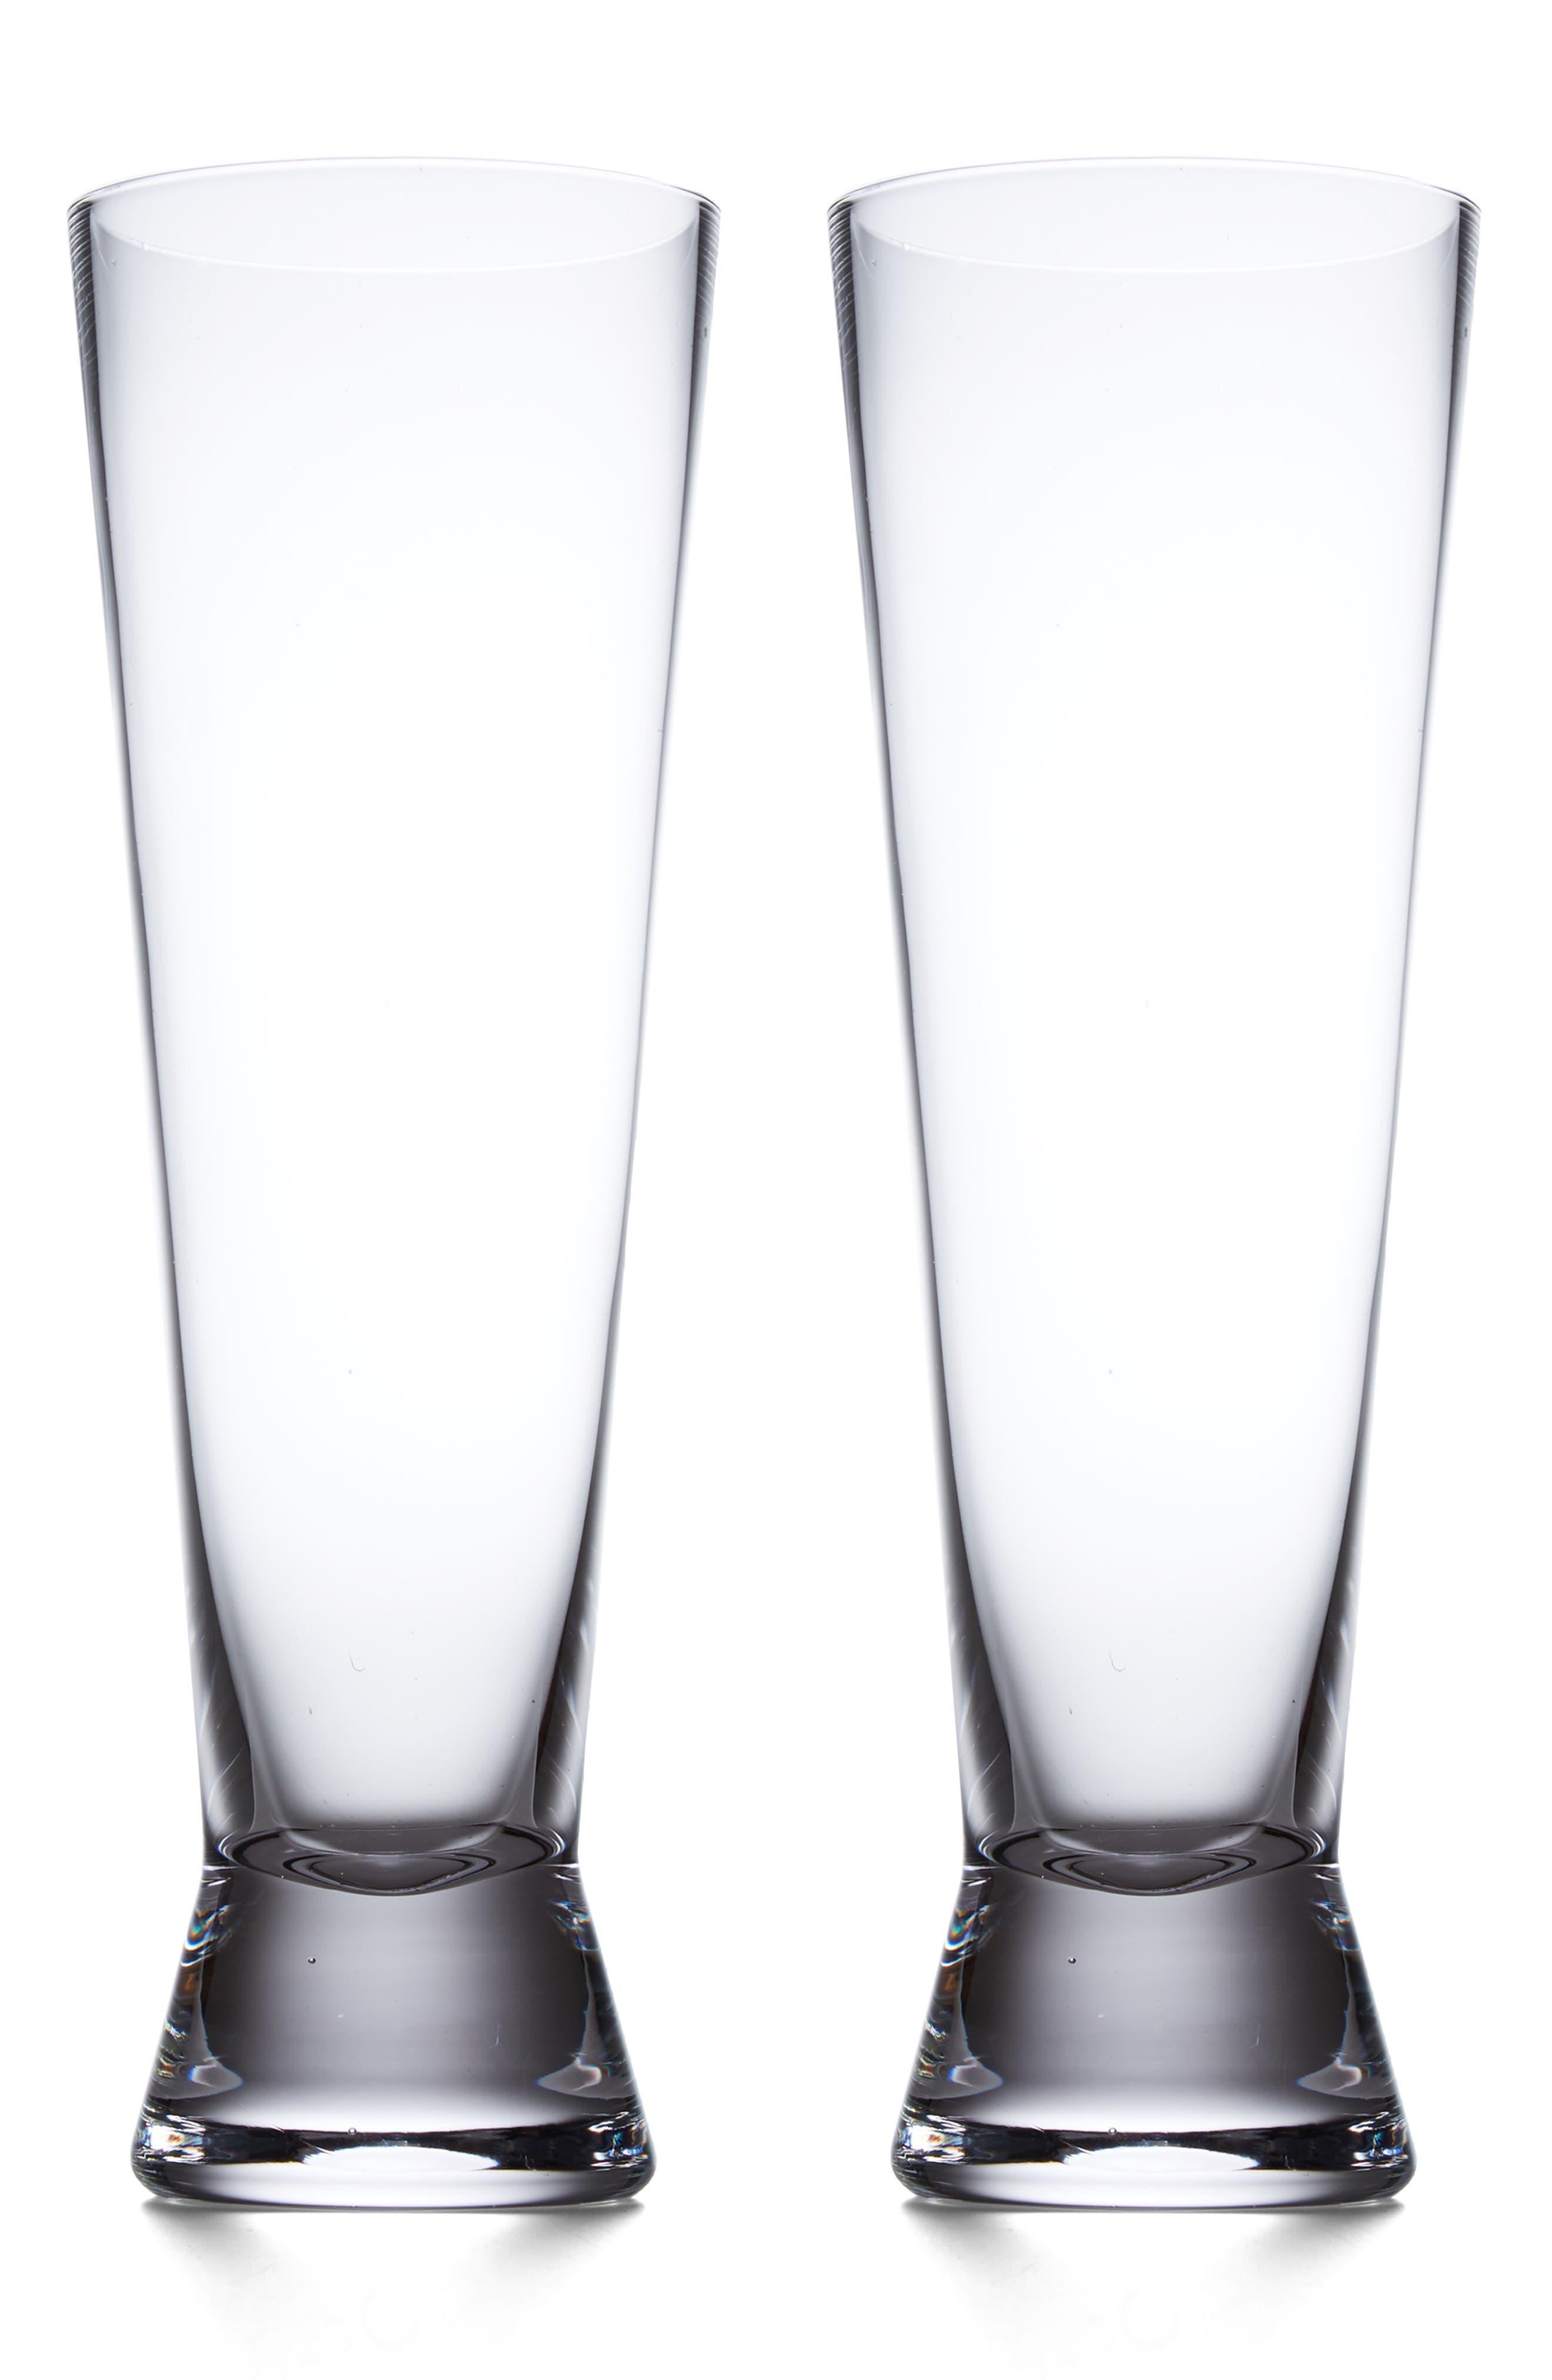 Main Image - Viski by True Fabrications Raye Set of 2 Pilsner Glasses